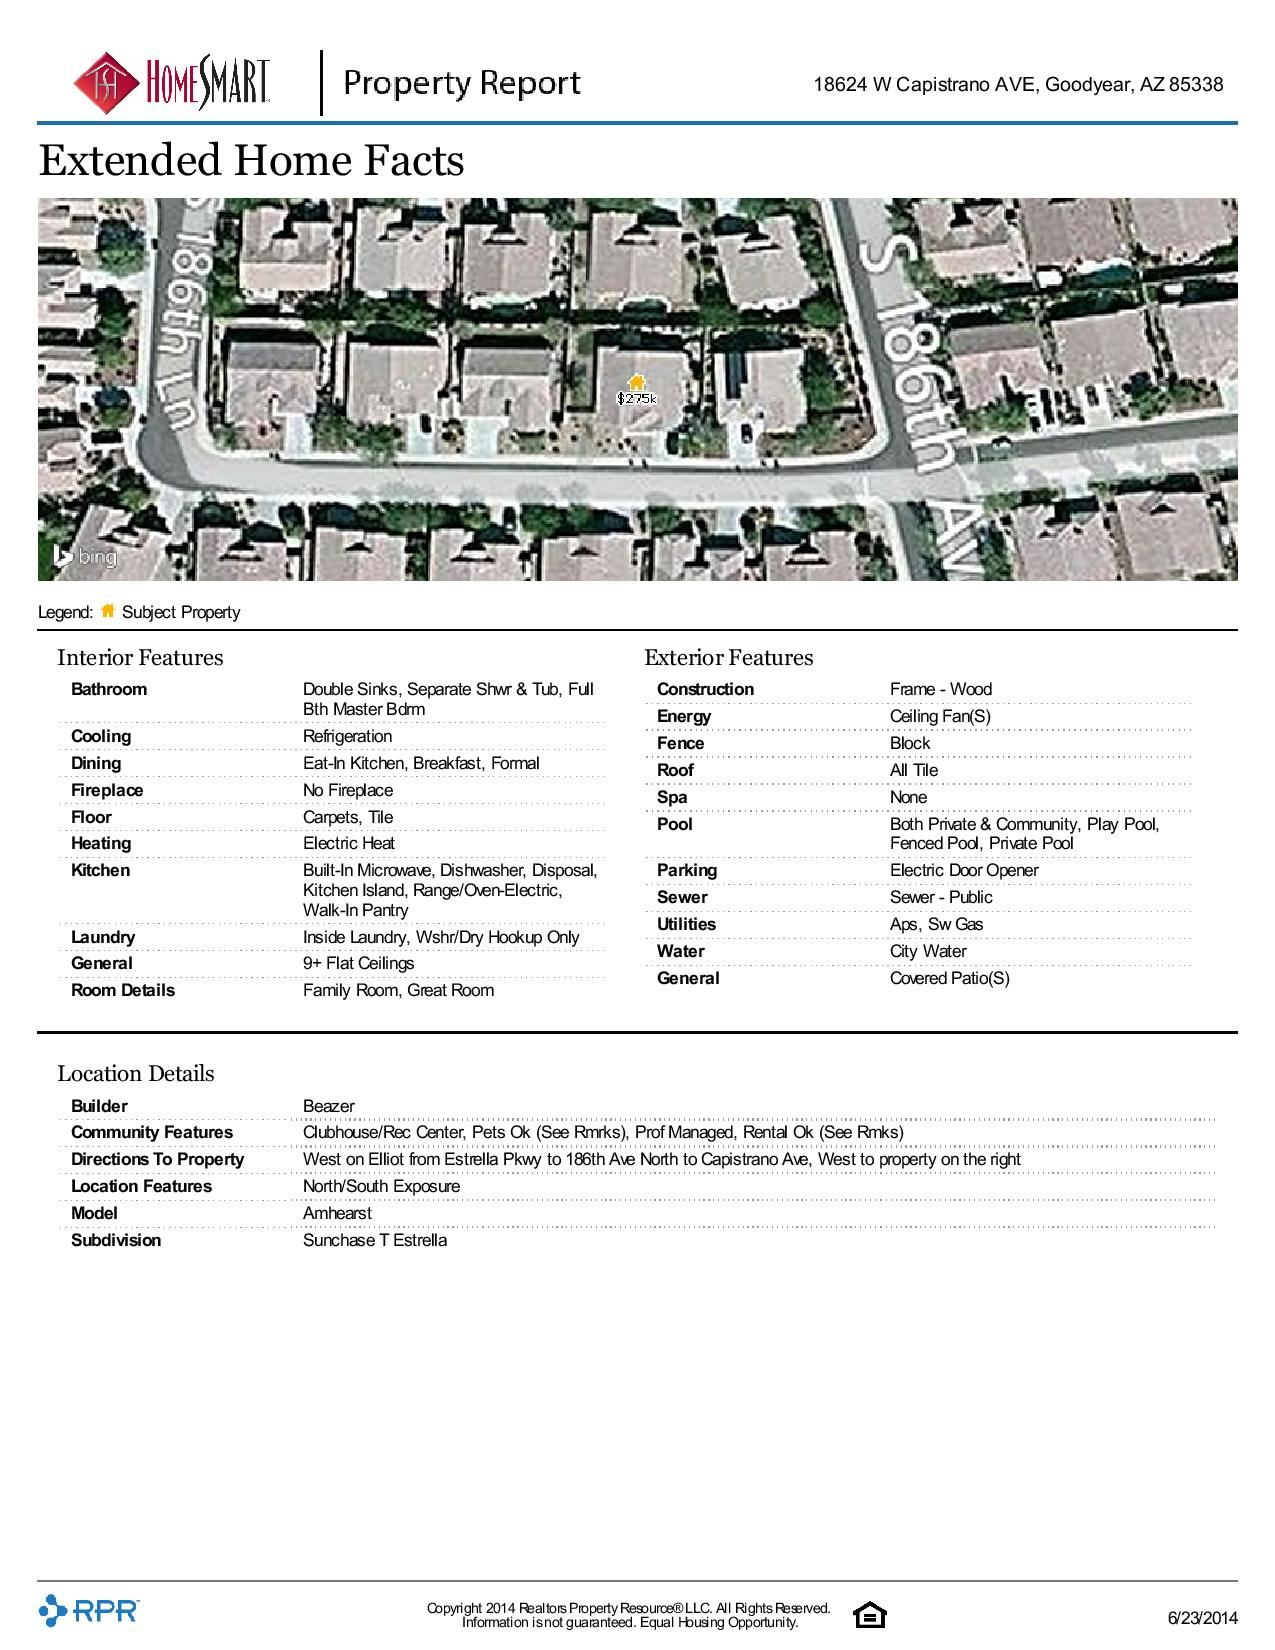 18624-W-Capistrano-AVE-Goodyear-AZ-85338-page-004